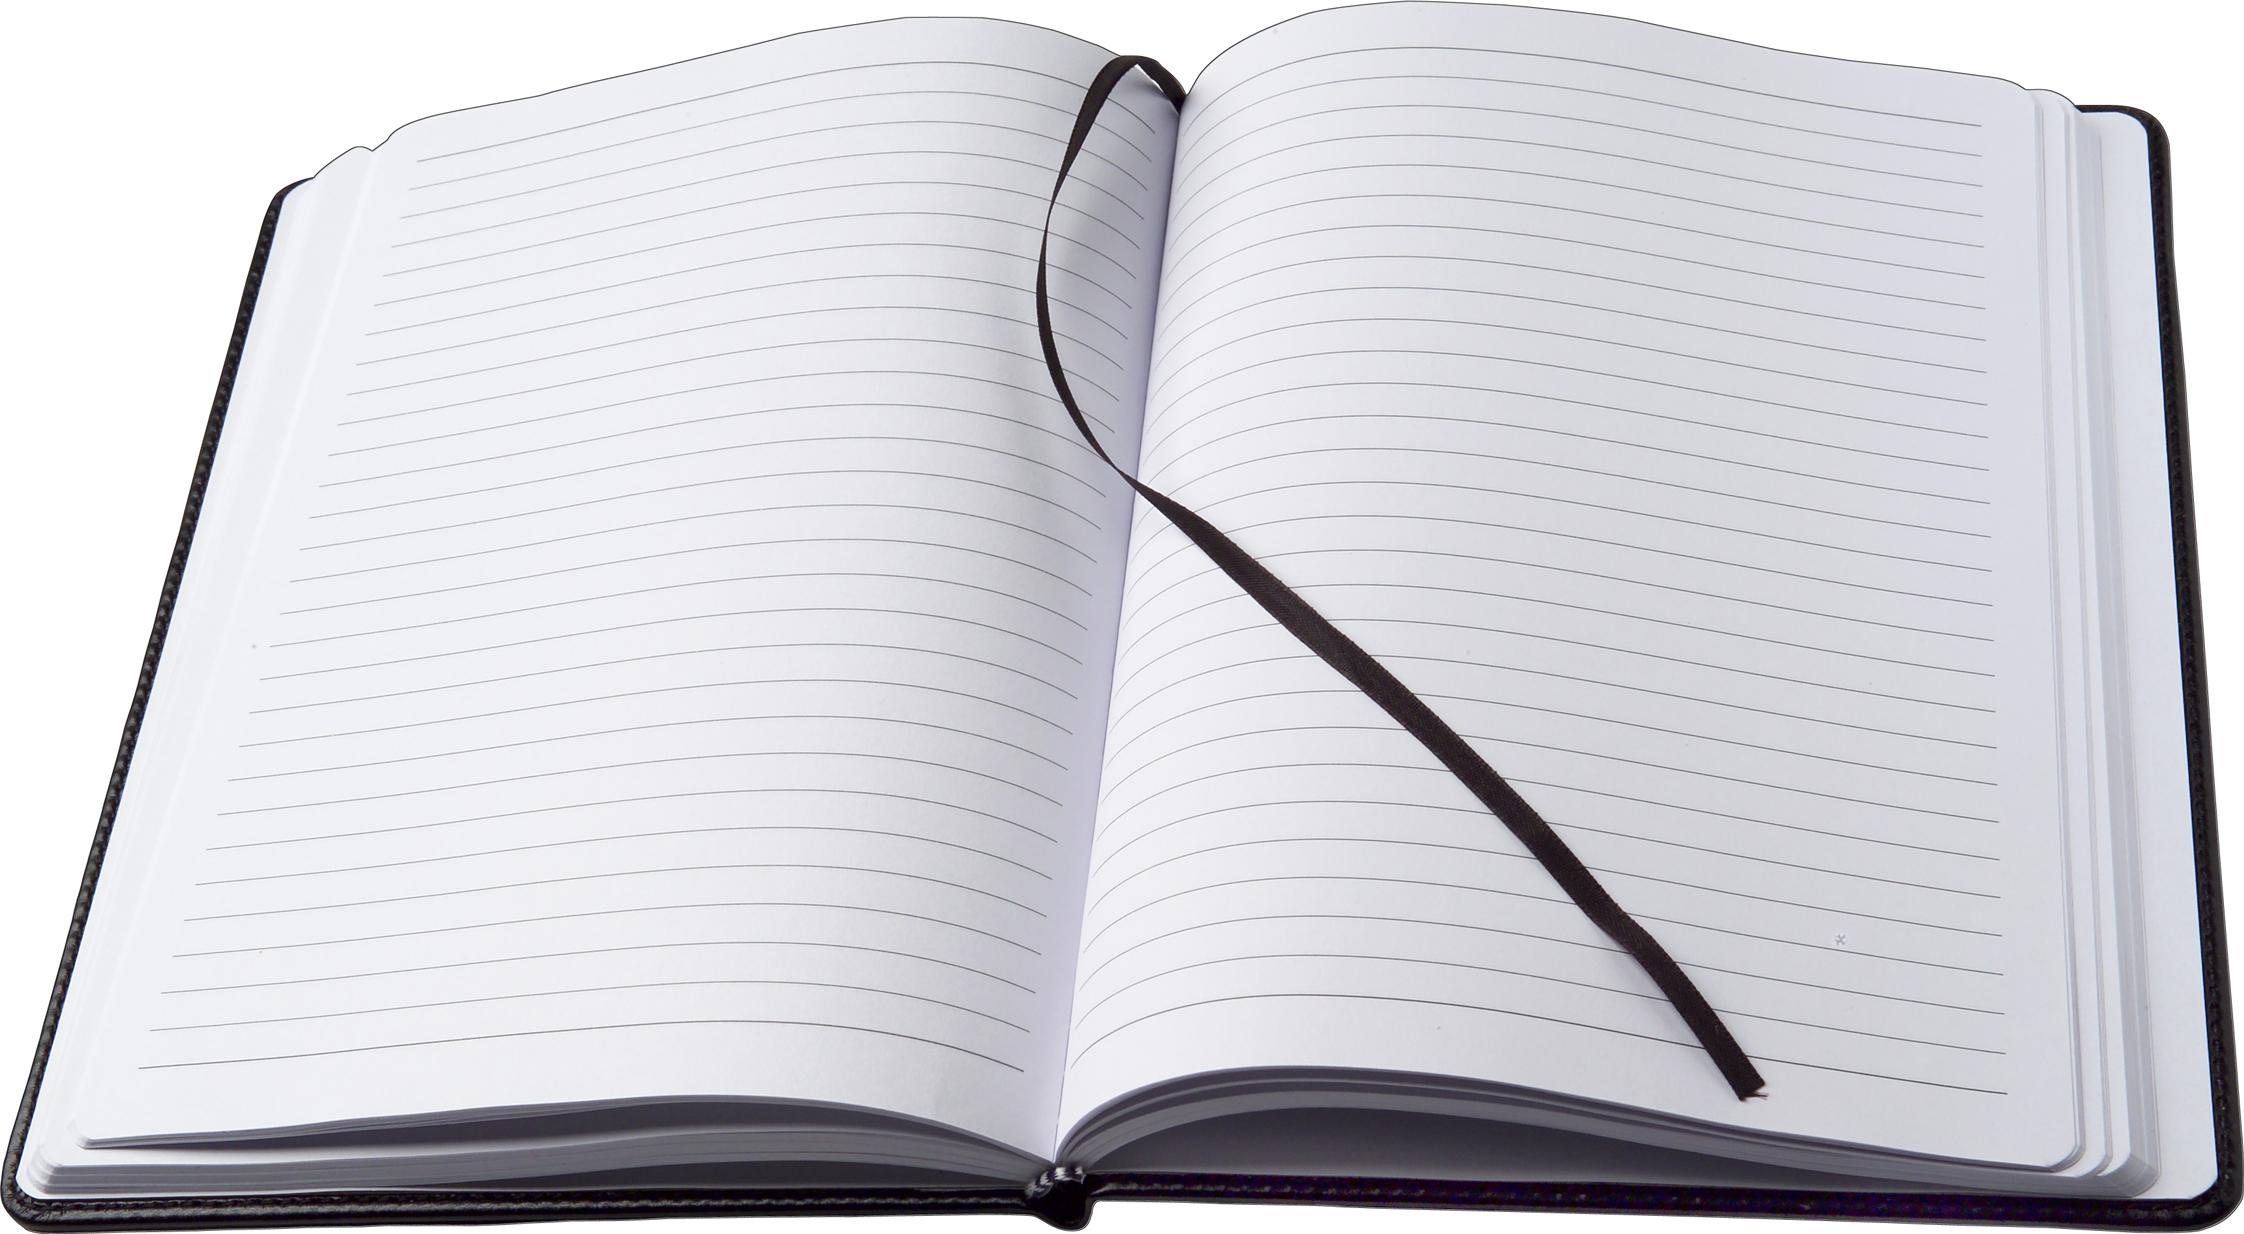 Promotional Notebook in a PU case